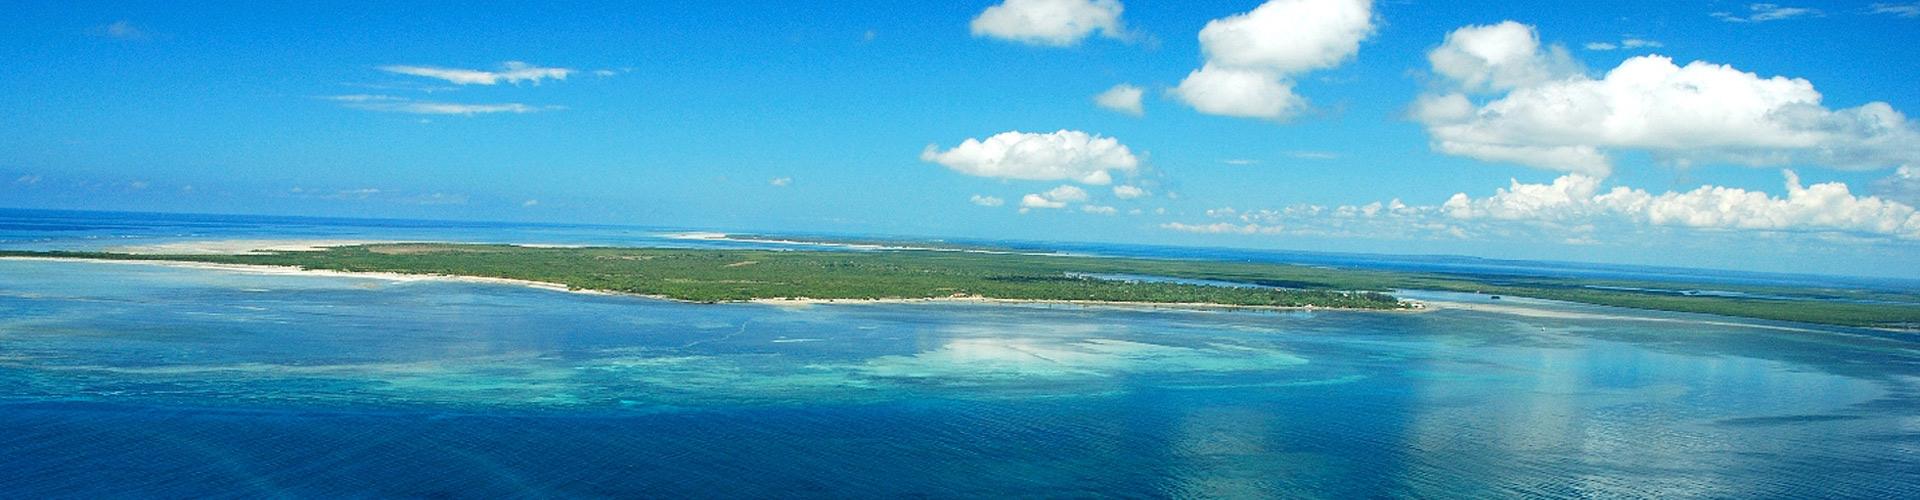 Ibo Island Quirimbas